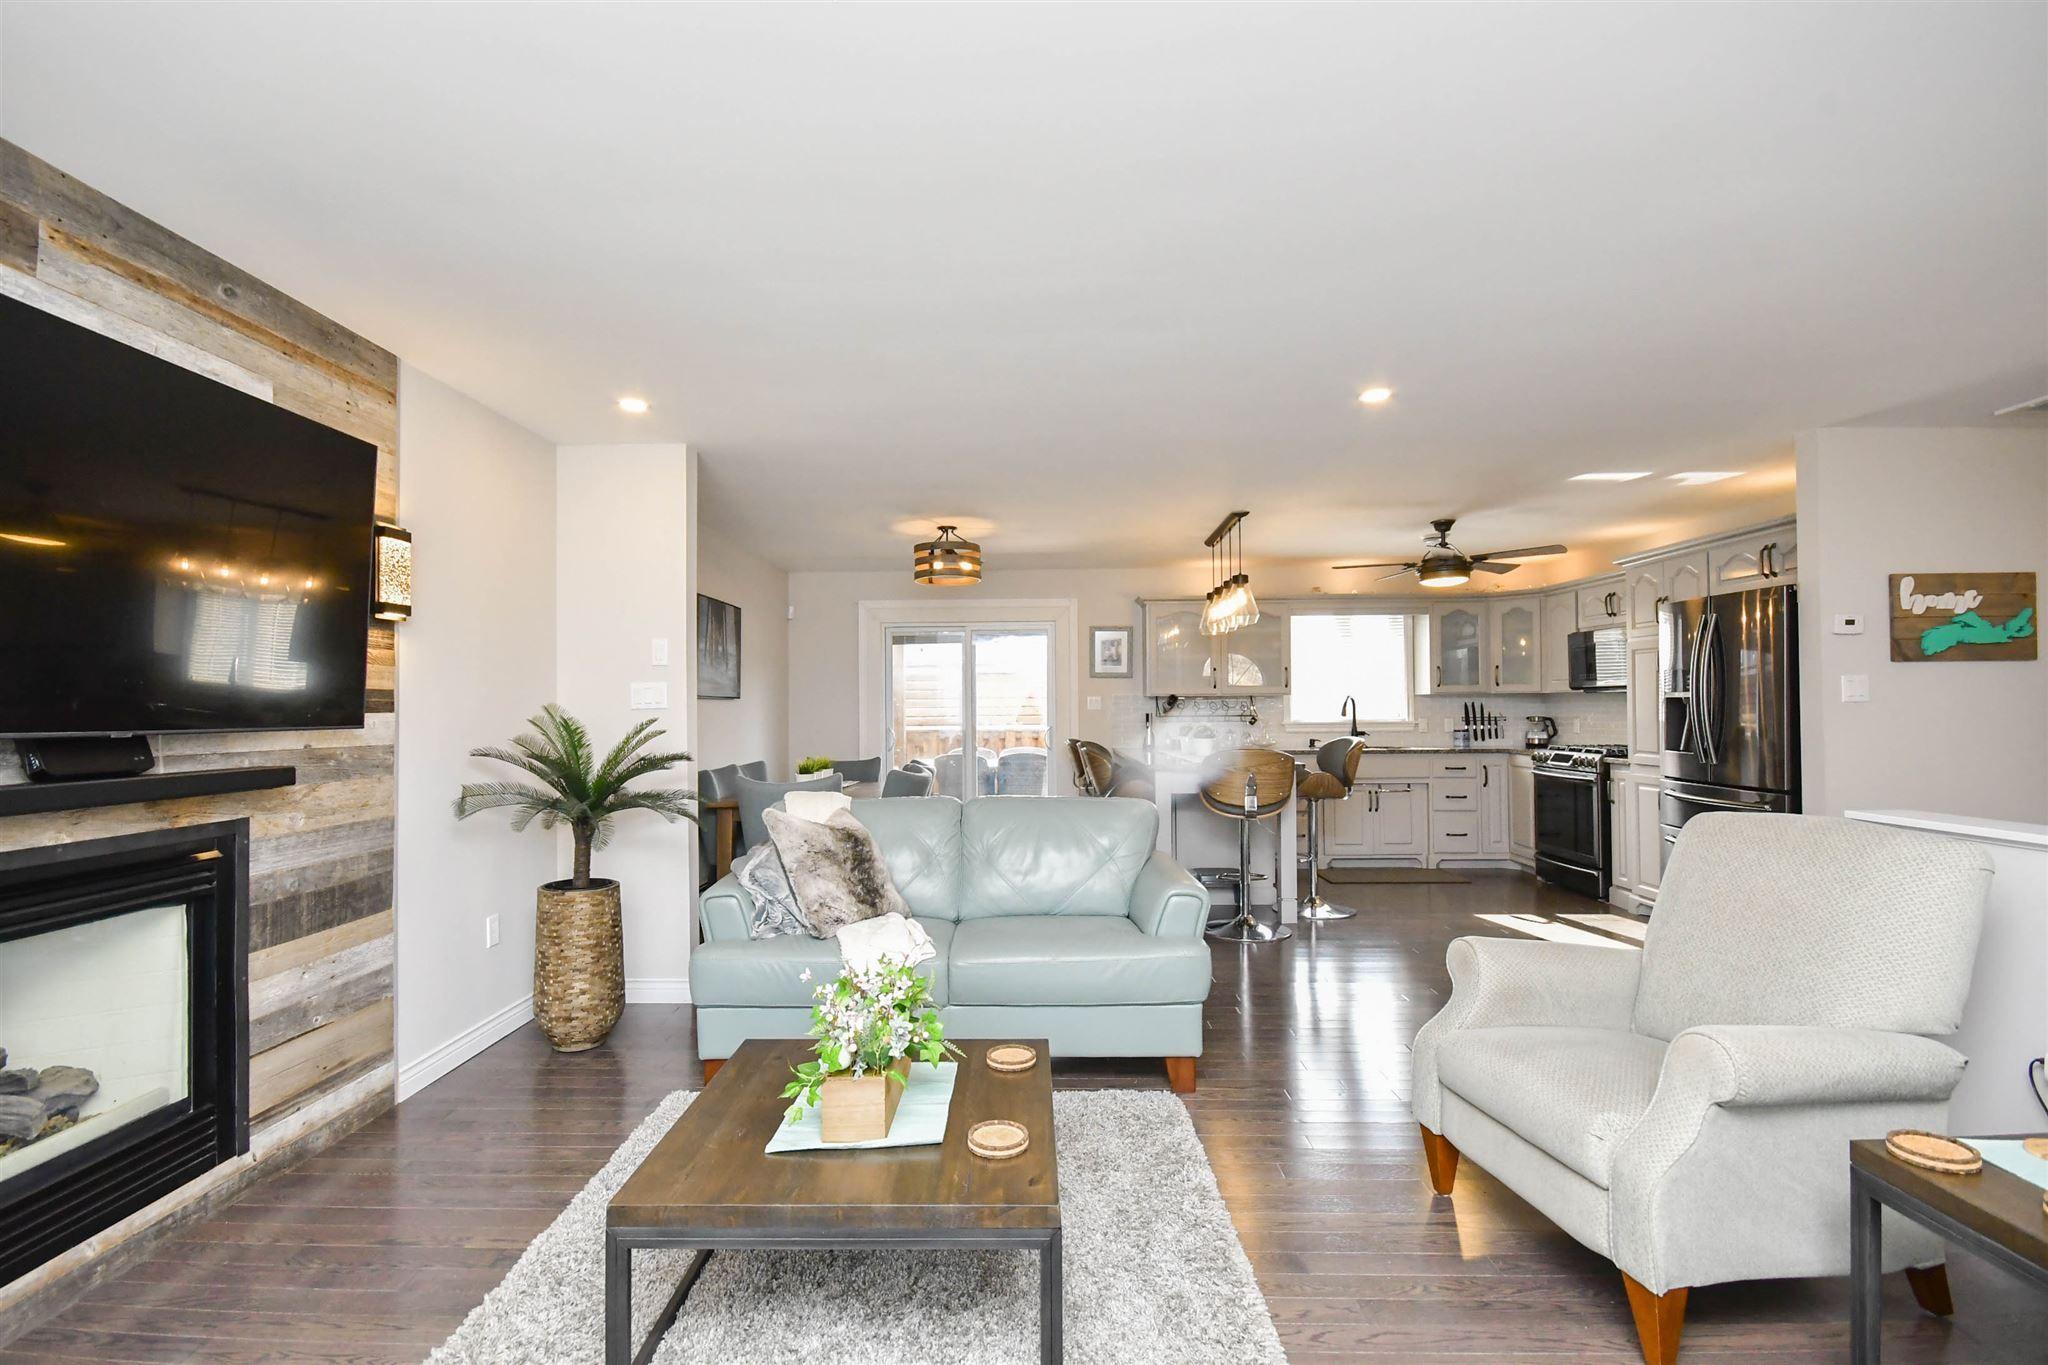 Photo 6: Photos: 17 Armstrong Court in Halifax: 5-Fairmount, Clayton Park, Rockingham Residential for sale (Halifax-Dartmouth)  : MLS®# 202105075